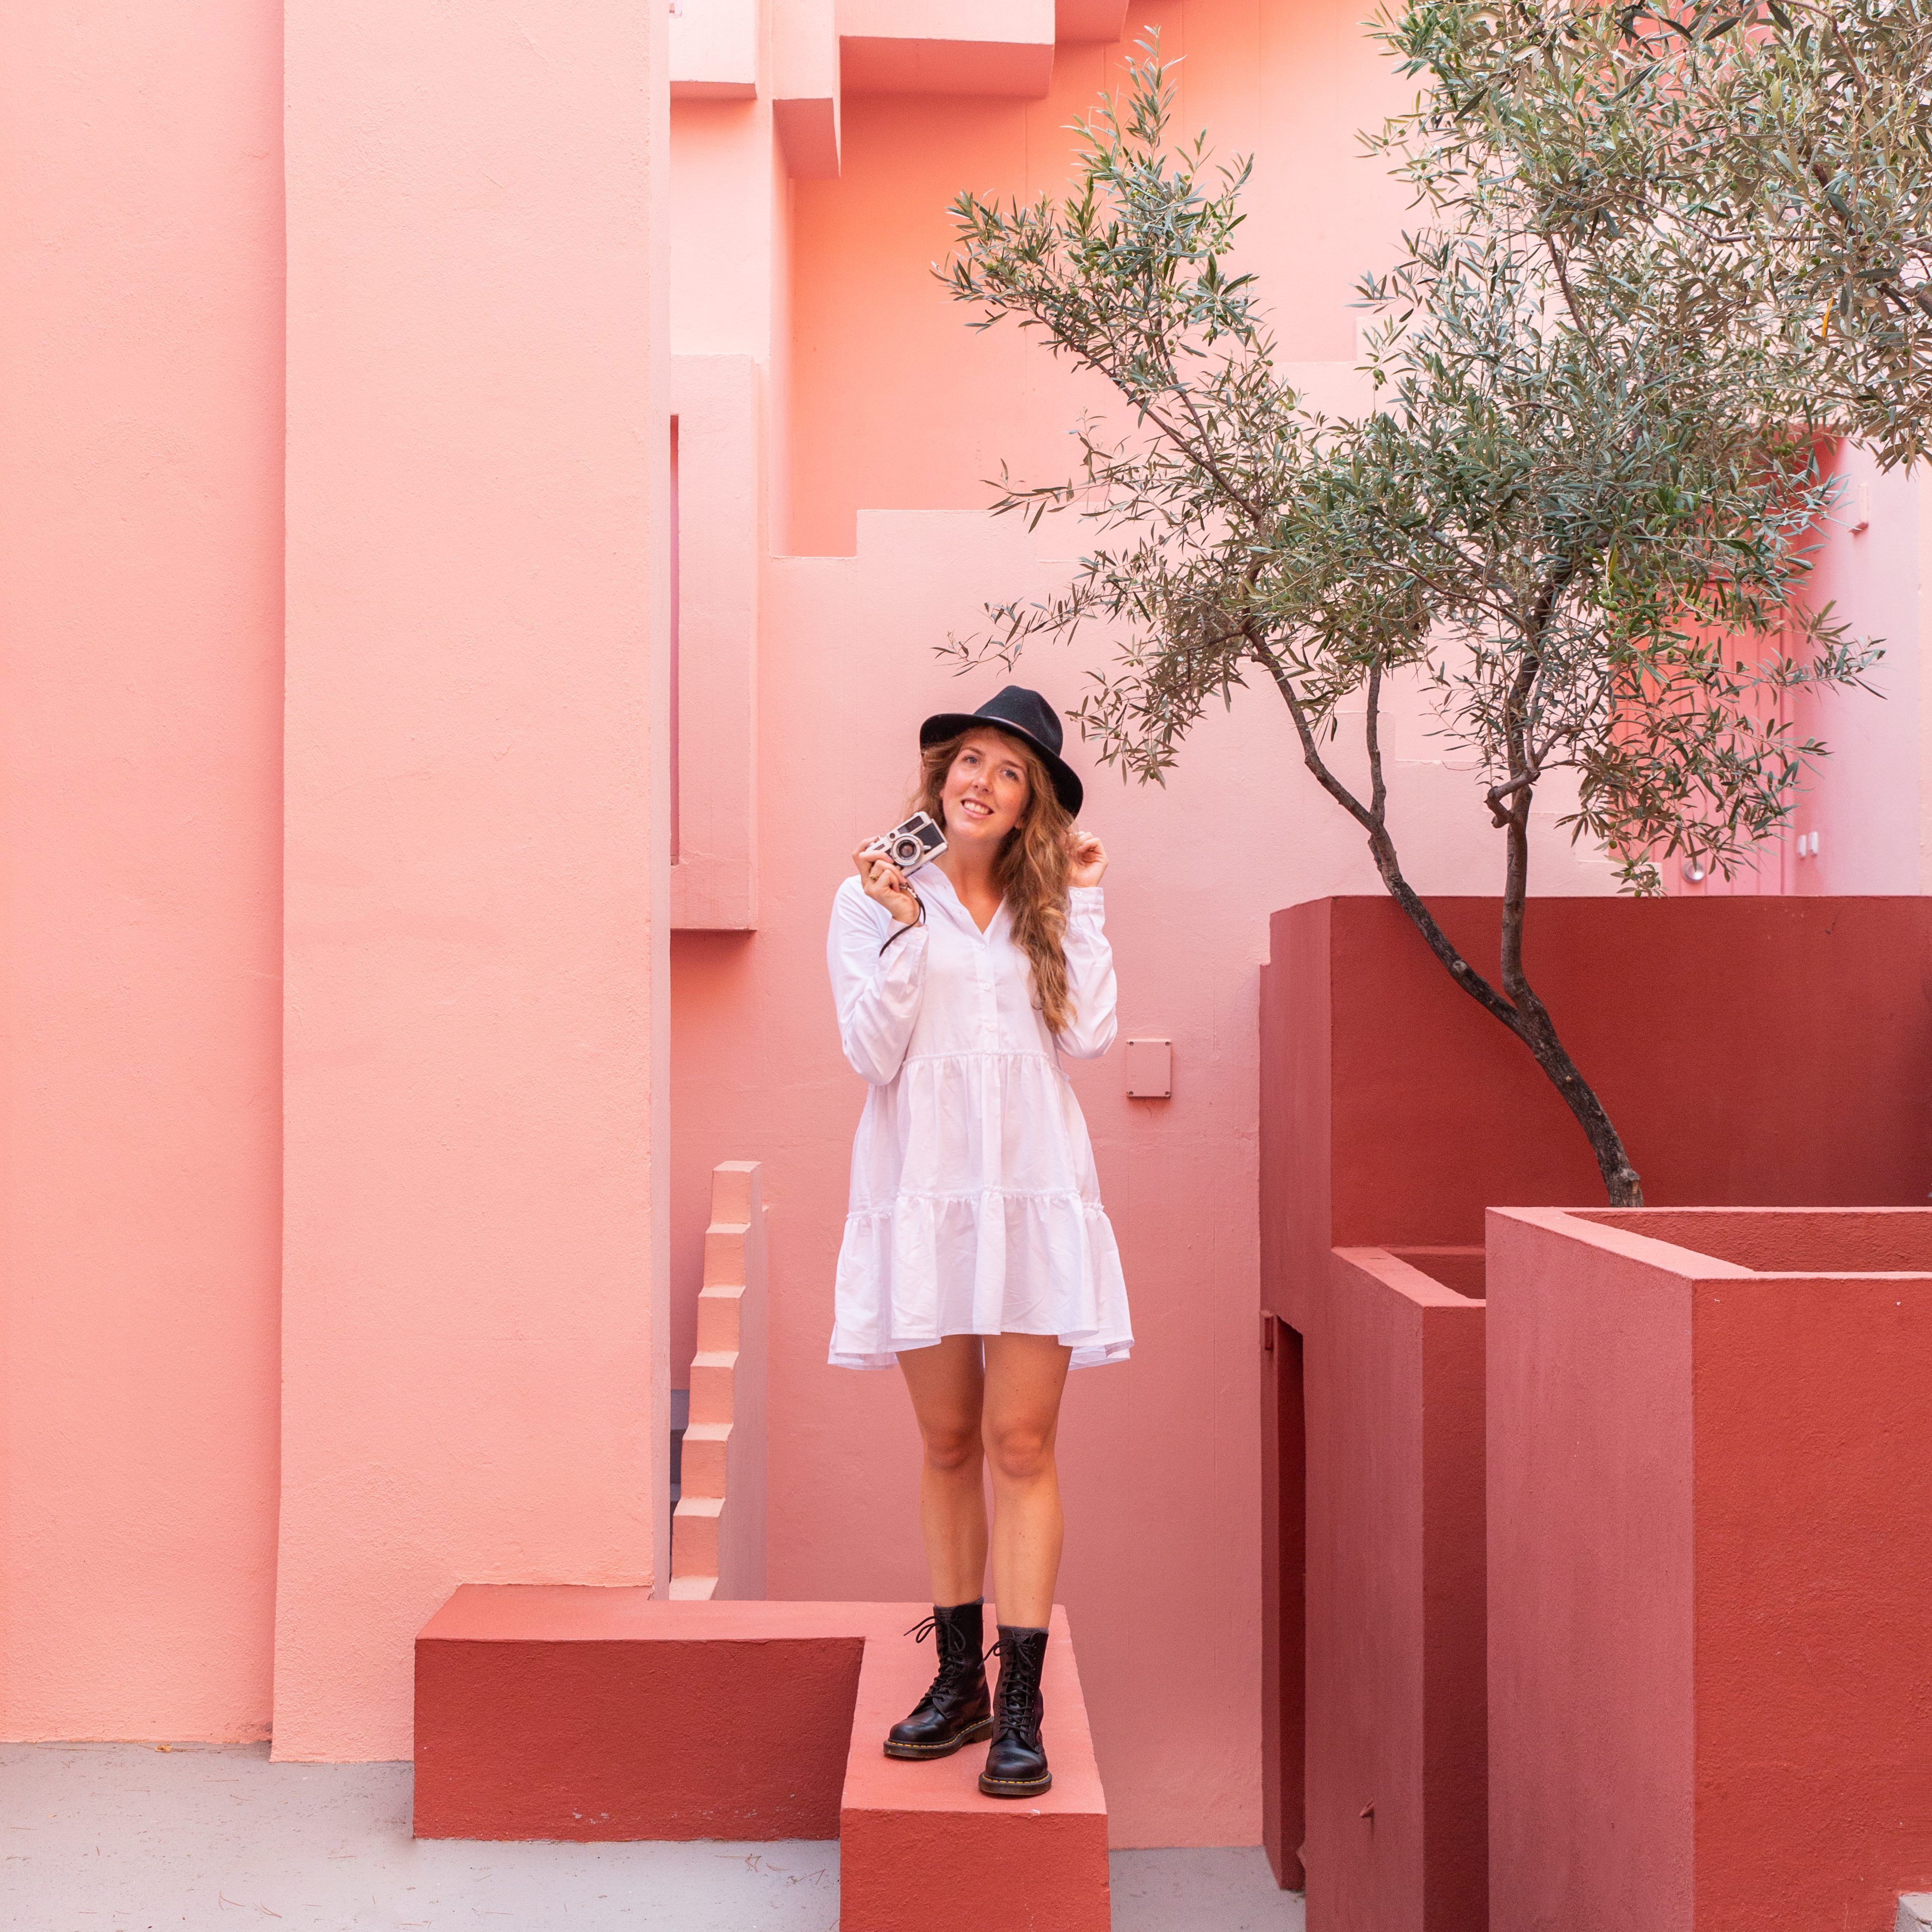 Ileenja Marina Photography - Content Creator